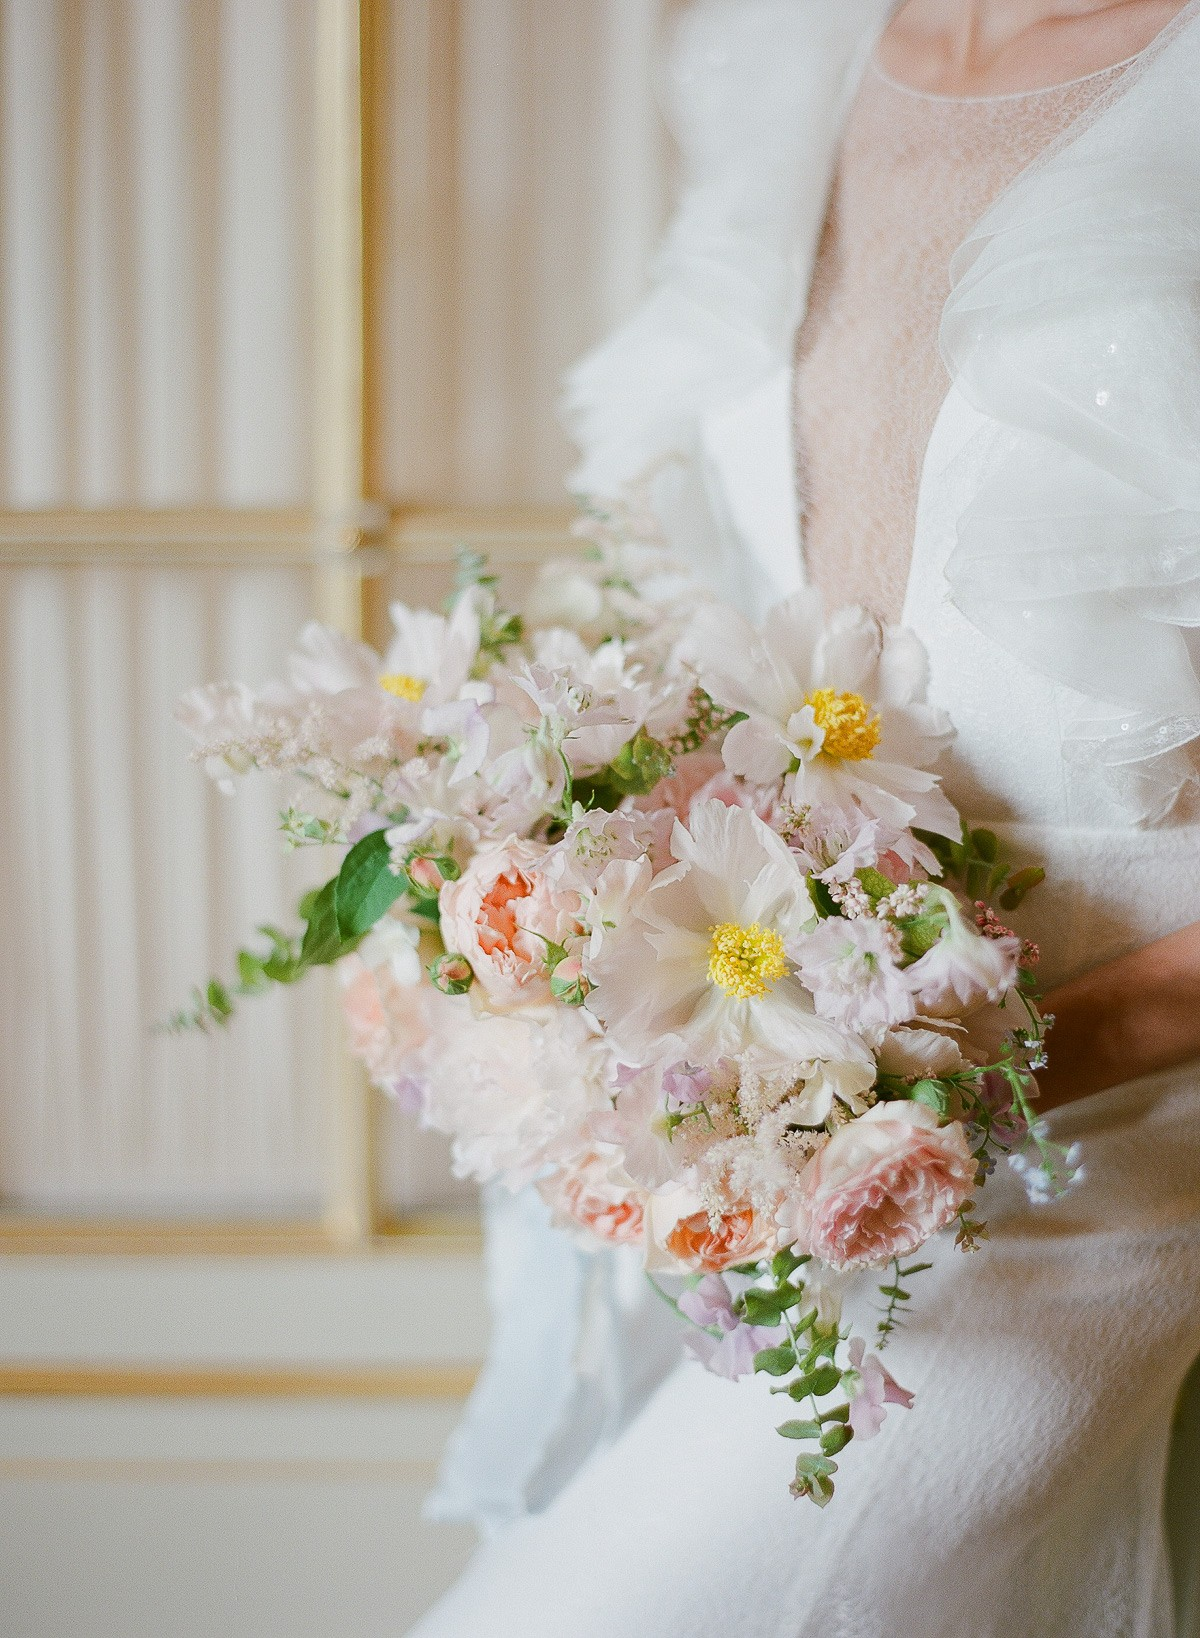 Parisian Floral Heaven - Inspiration from Greg Finck & Joy Proctor